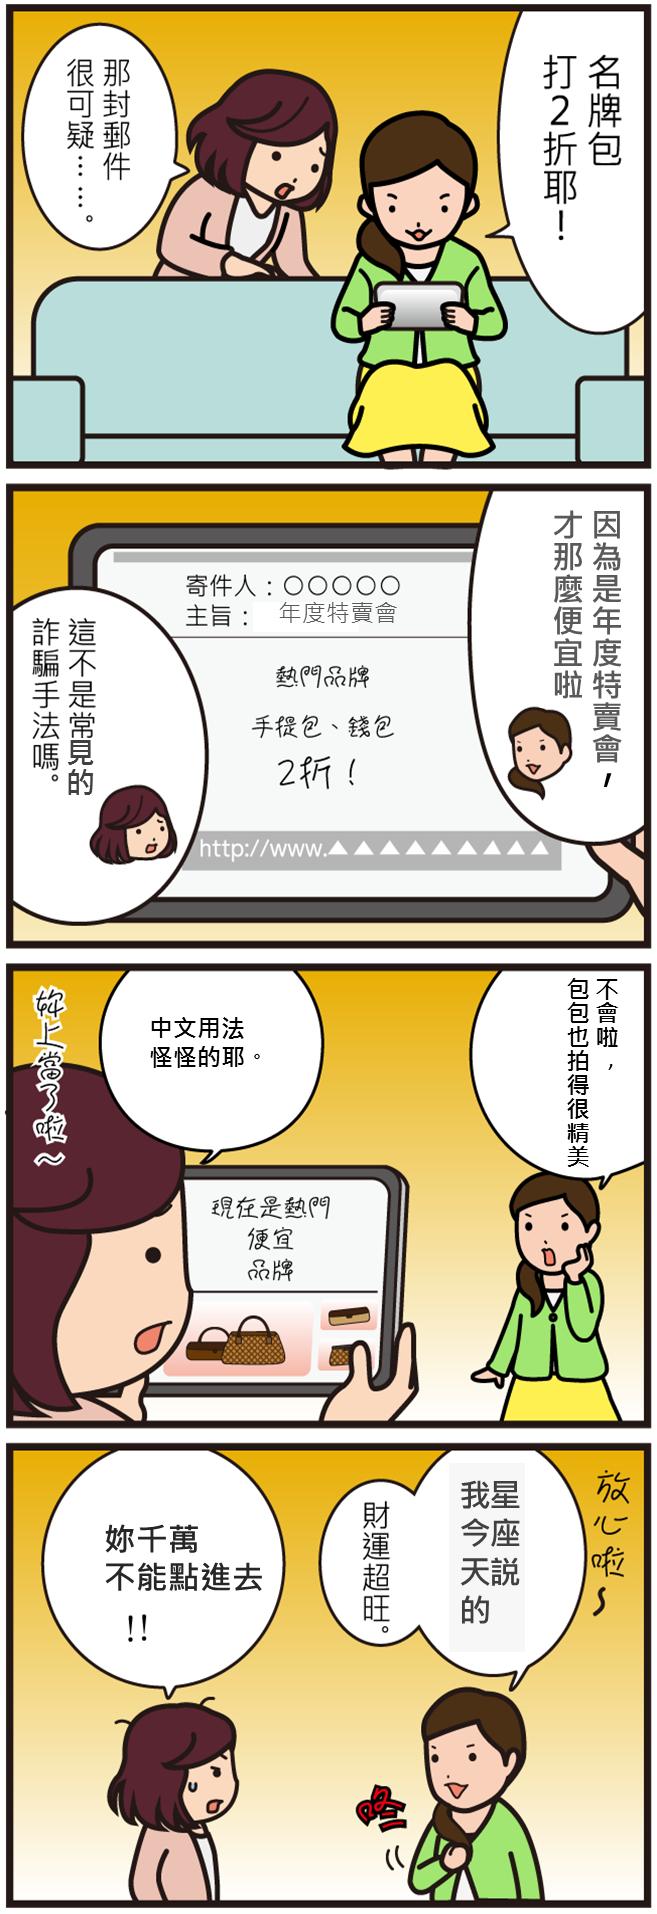 資安漫畫 網路釣魚 9 phishing